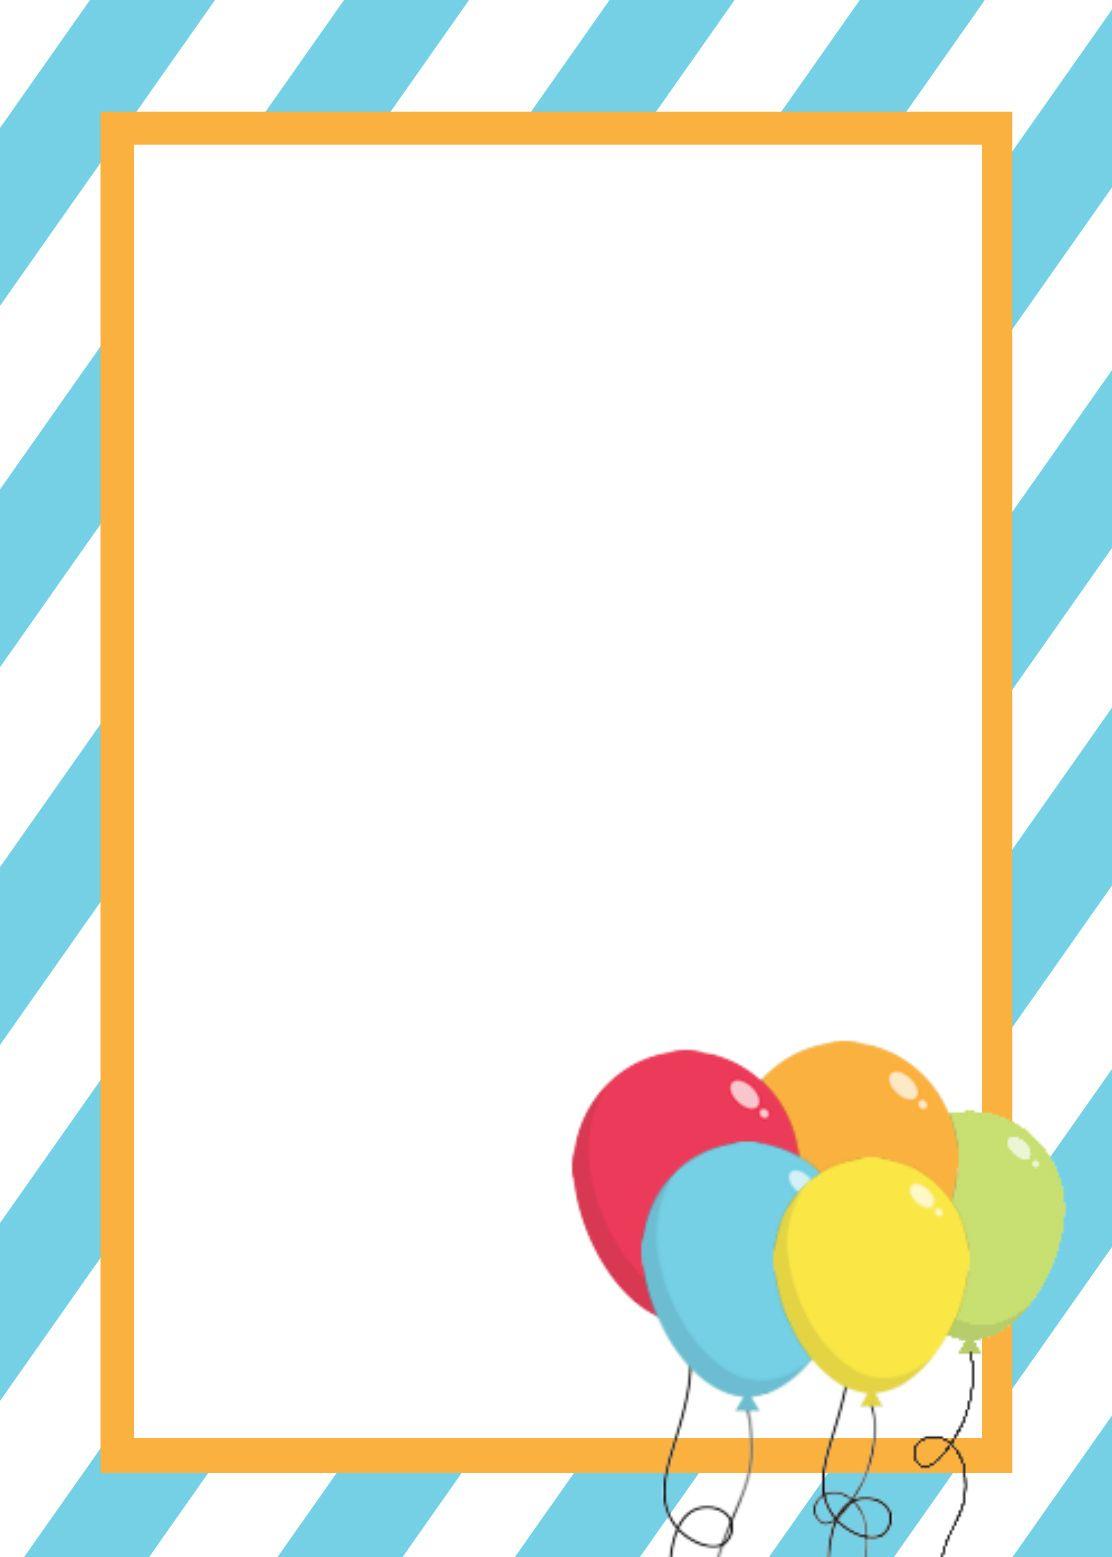 Free Printable Birthday Invitation Templates | Birthday Ideas And - Free Printable Birthday Invitations